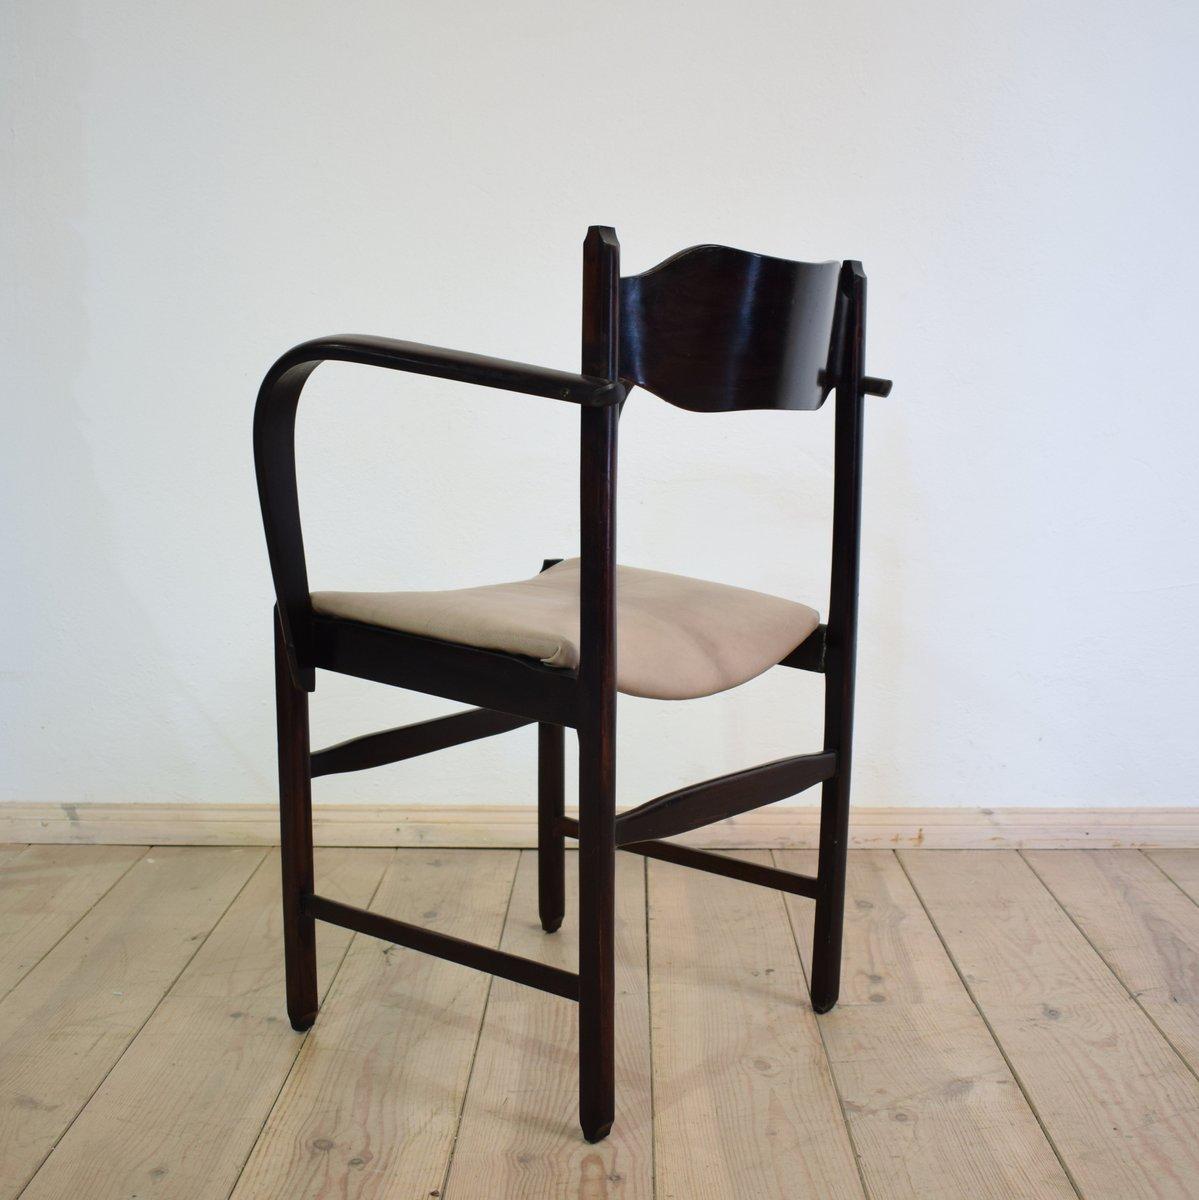 italienischer art deco armlehnstuhl bei pamono kaufen. Black Bedroom Furniture Sets. Home Design Ideas